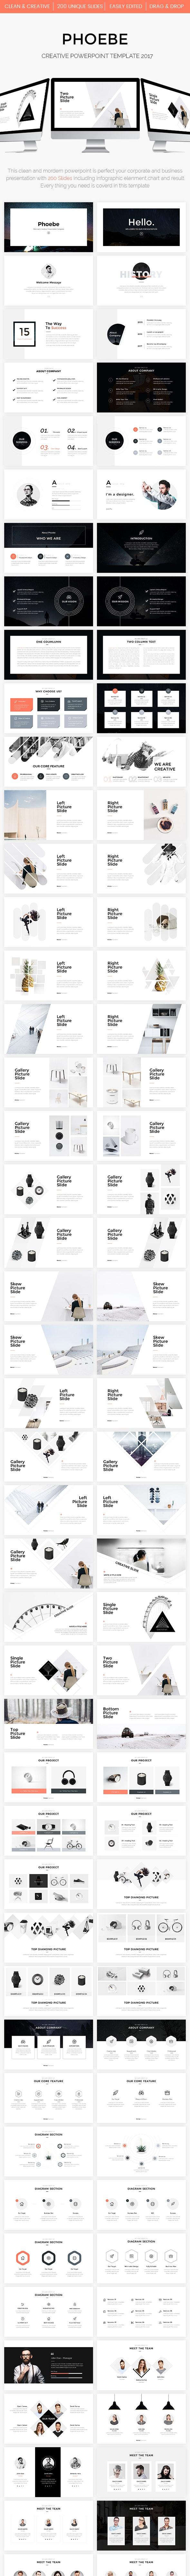 Phoebe - Creative Powerpoint Template - Creative PowerPoint Templates